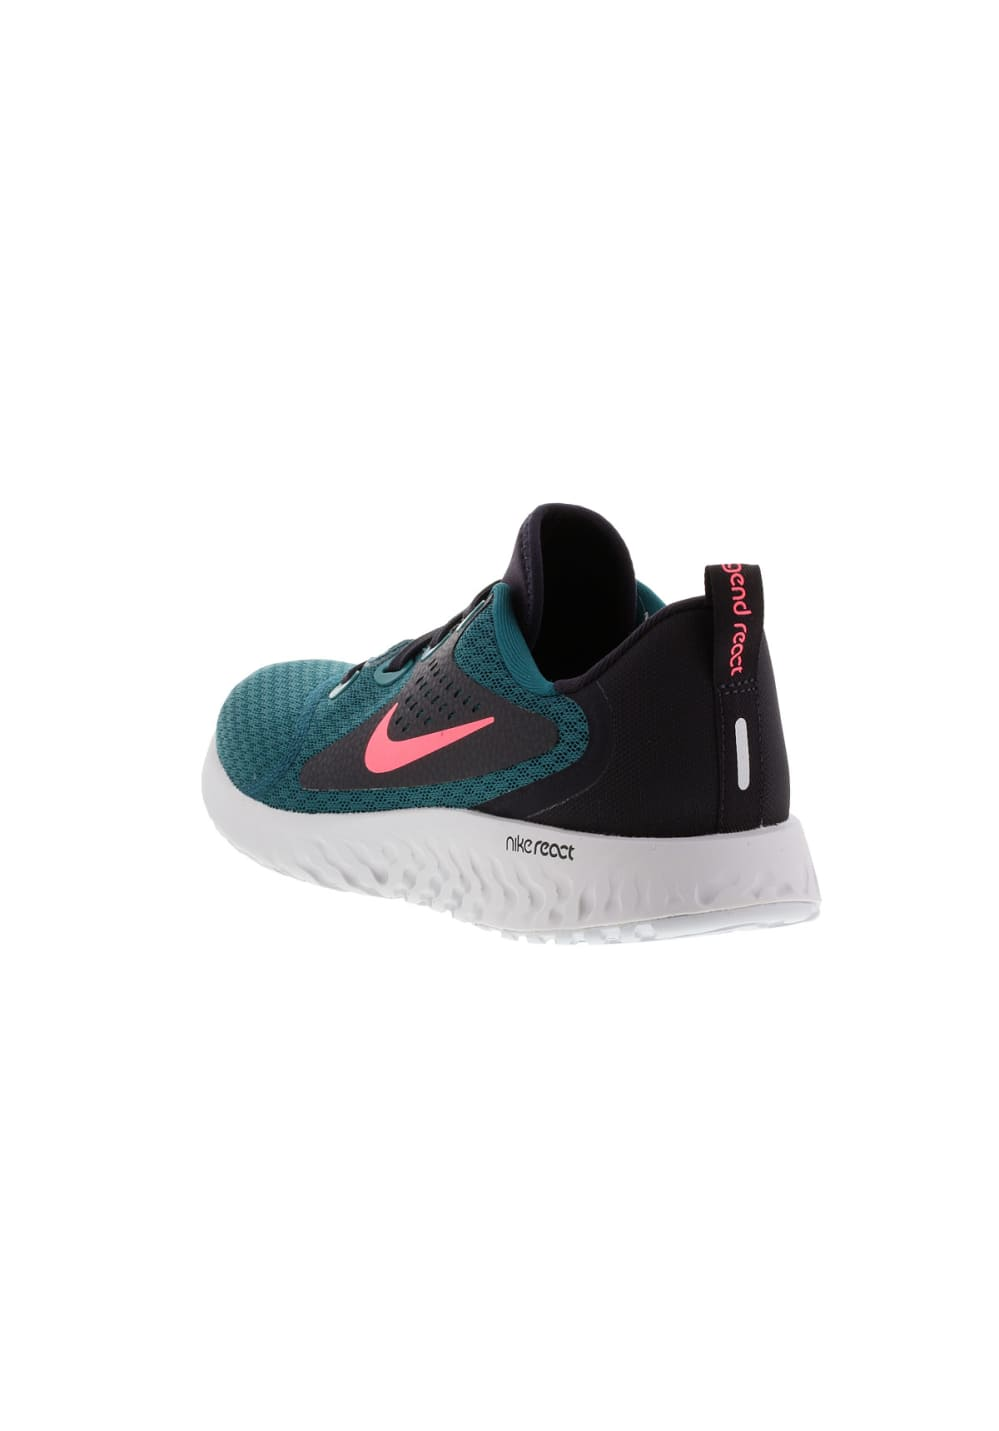 fc6cce61b2e Nike Legend React Gs Running Shoes For Boys Green 21run